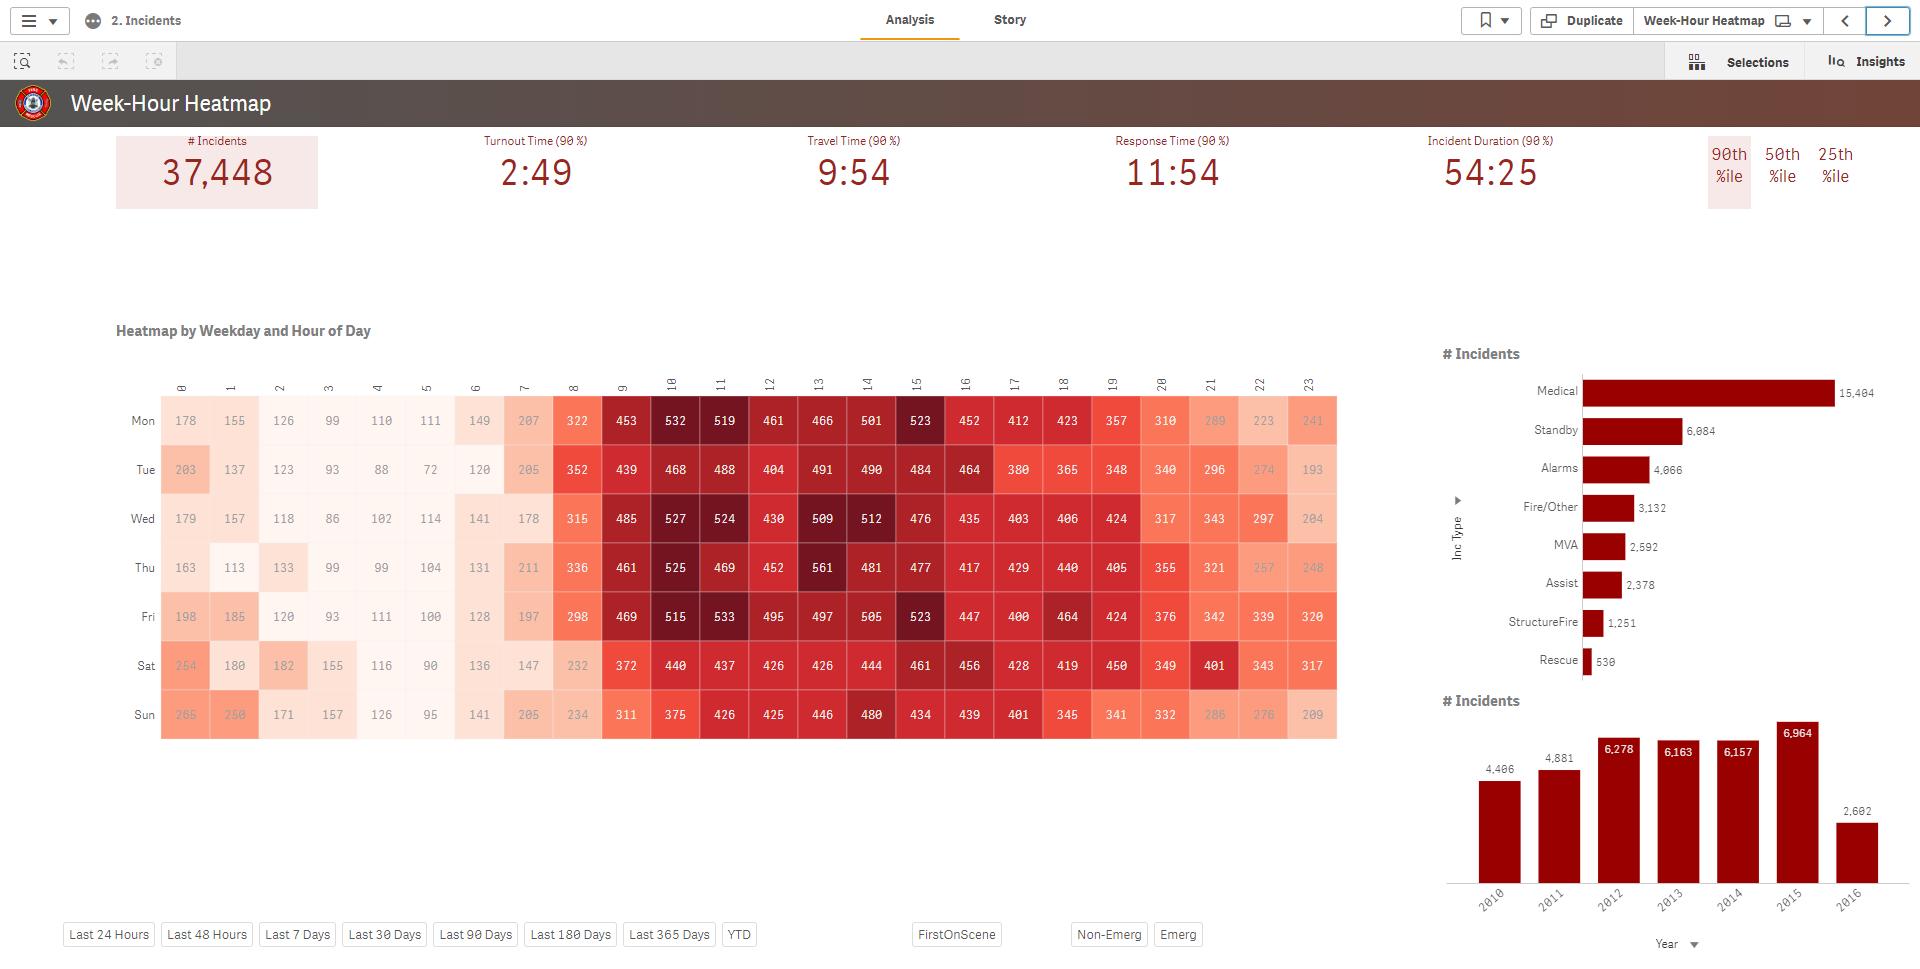 Incidents_Week-Hour Heatmap.png